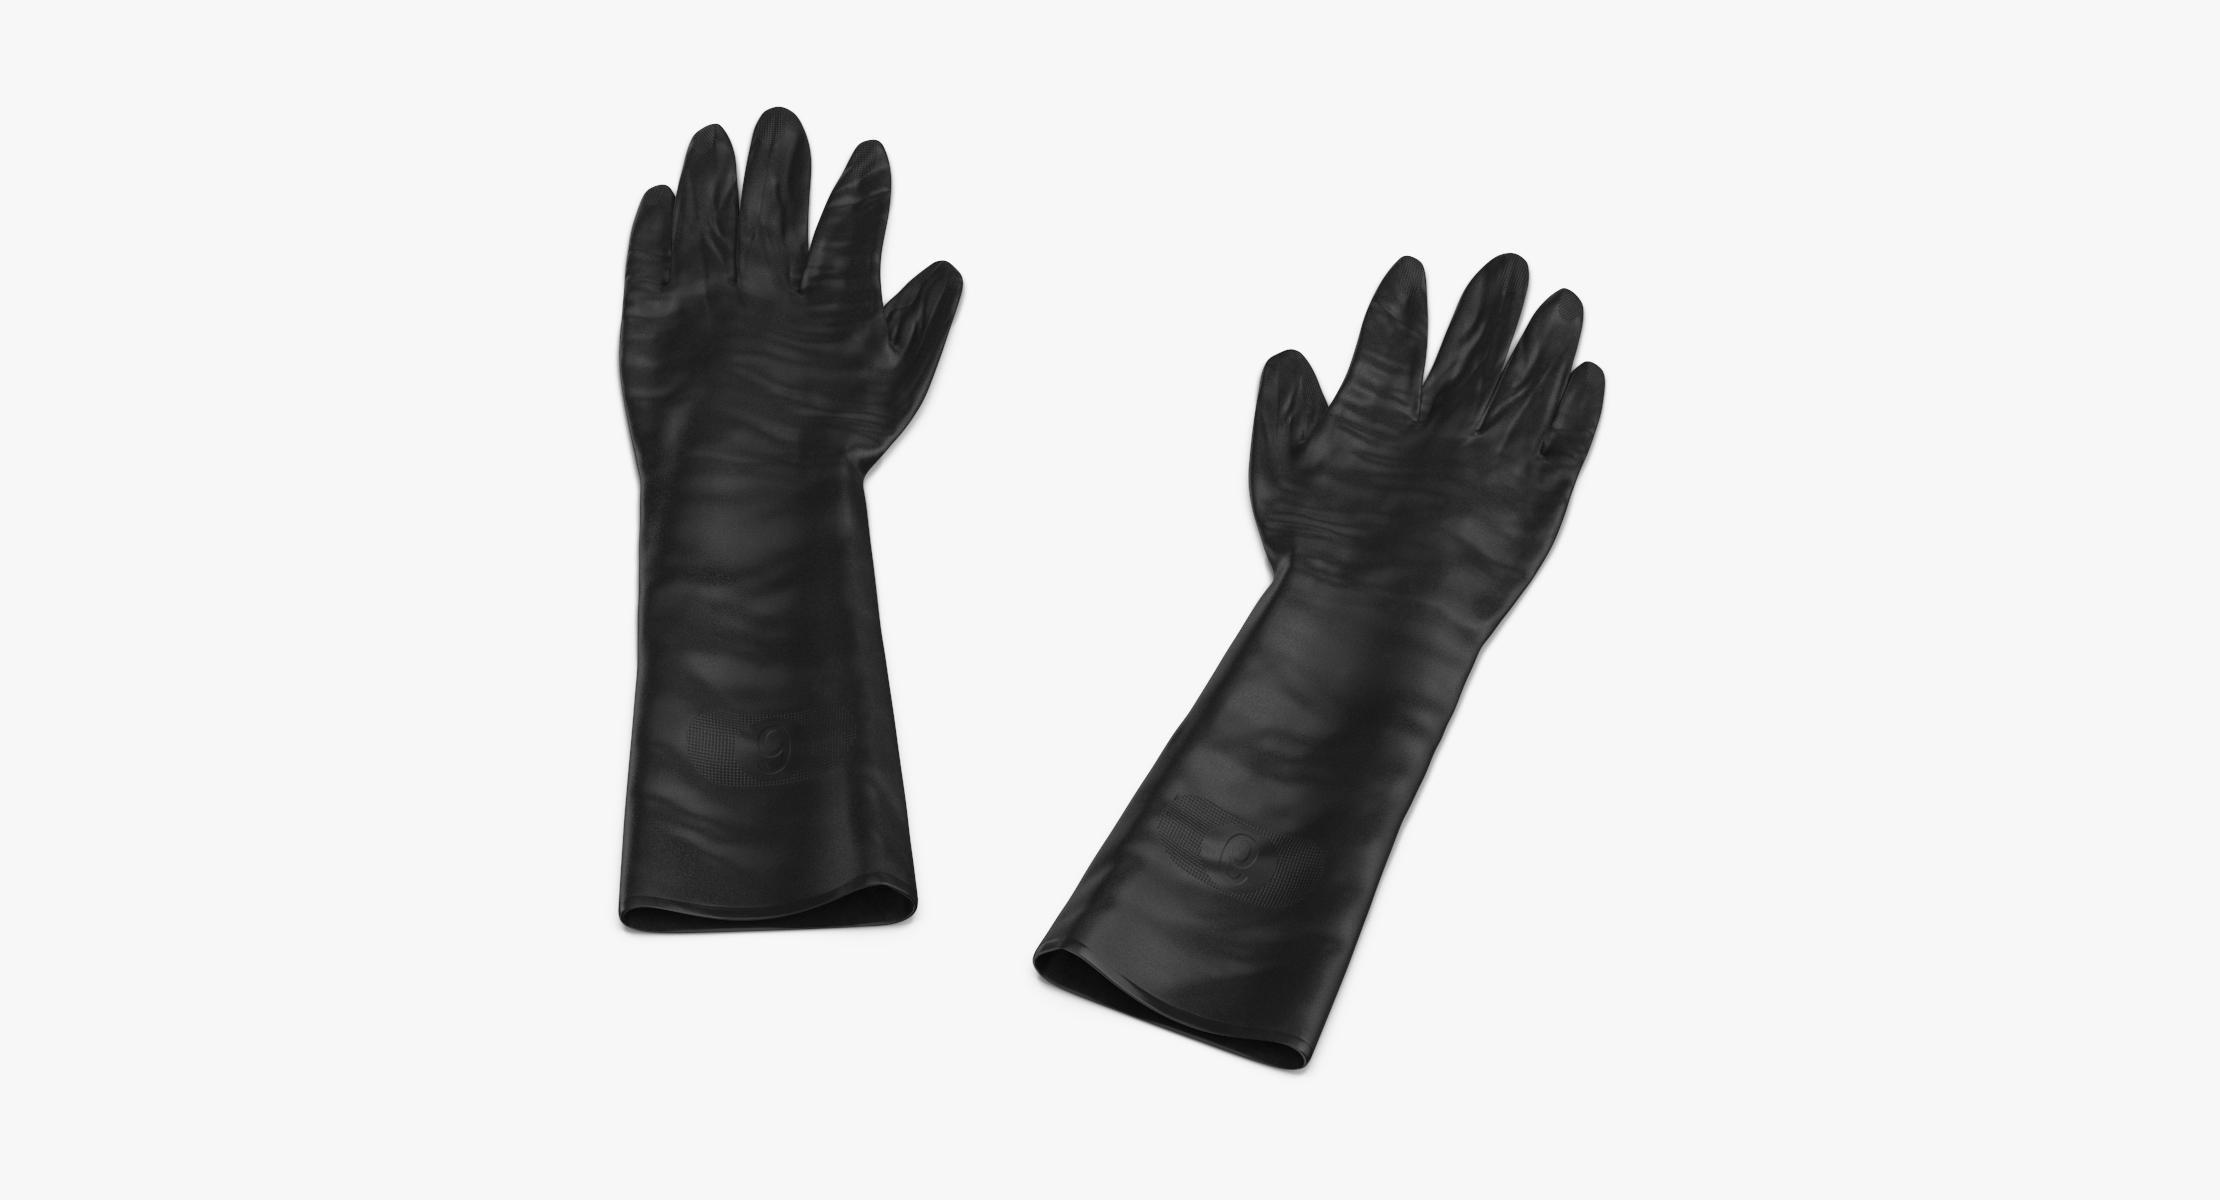 Large Black Rubber Lab Gloves Laying - reel 1